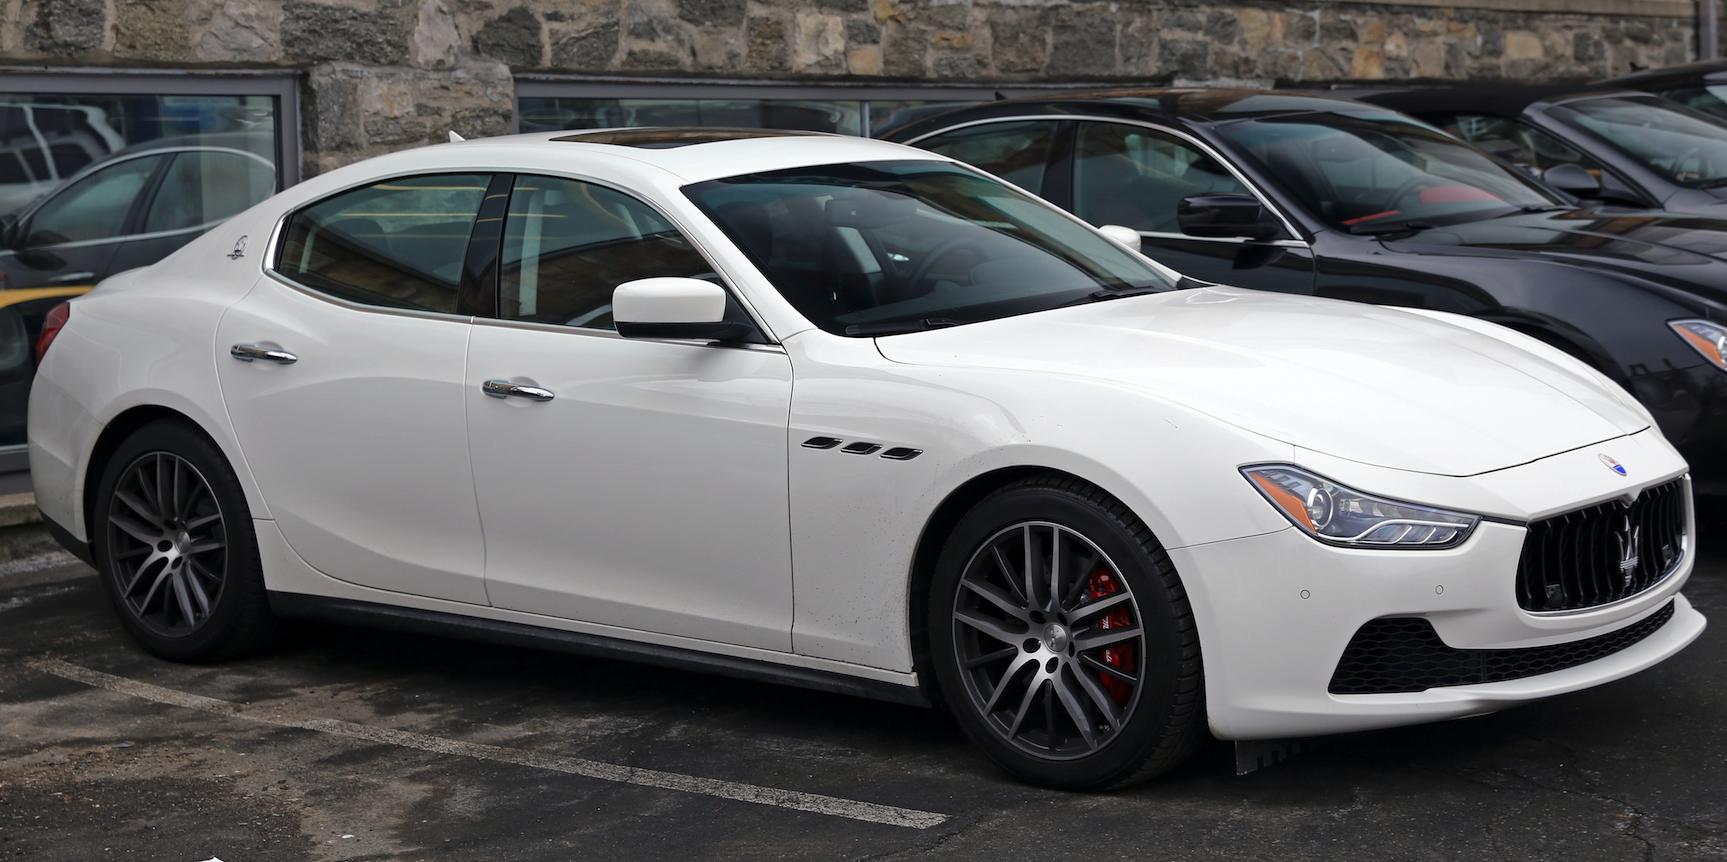 Li's parents bought him a Maserati like this